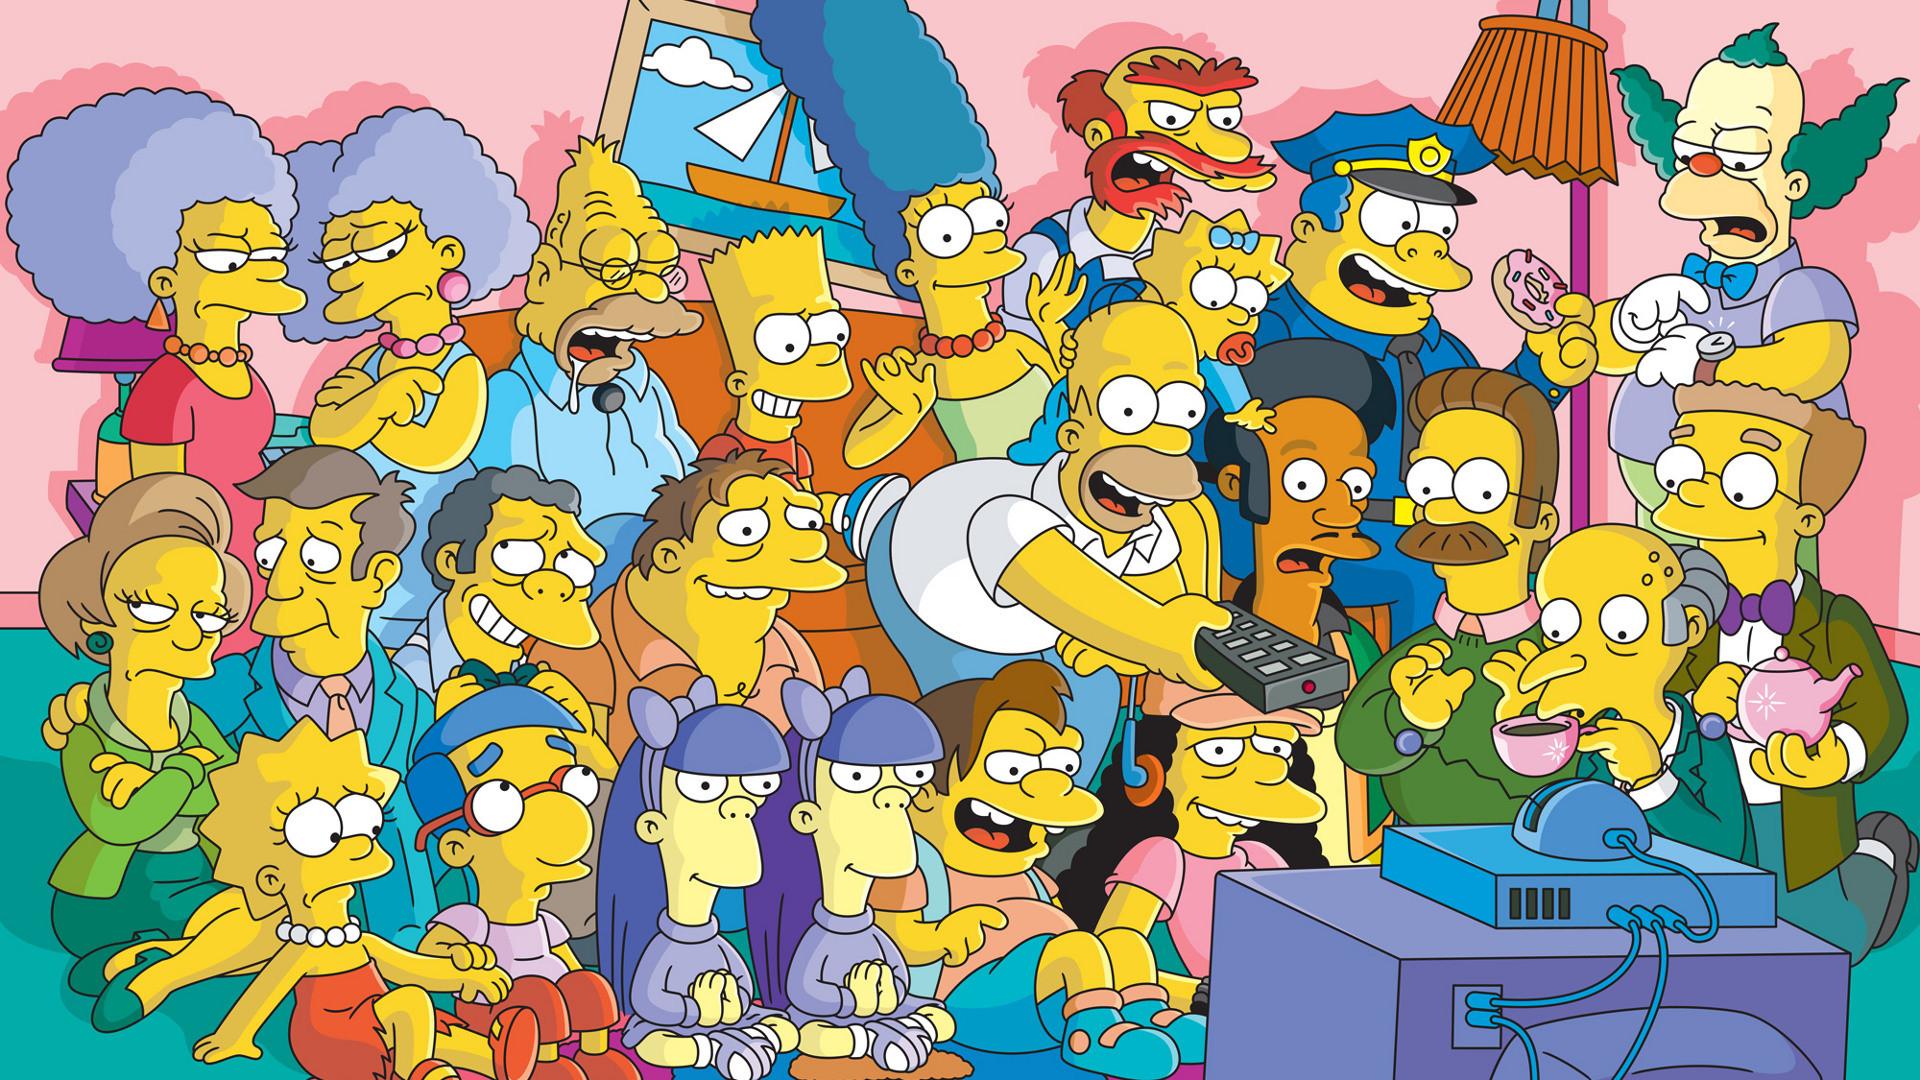 1920x1080, The Simpsons Wallpapers - Los Simpson Wallpaper 4k - HD Wallpaper